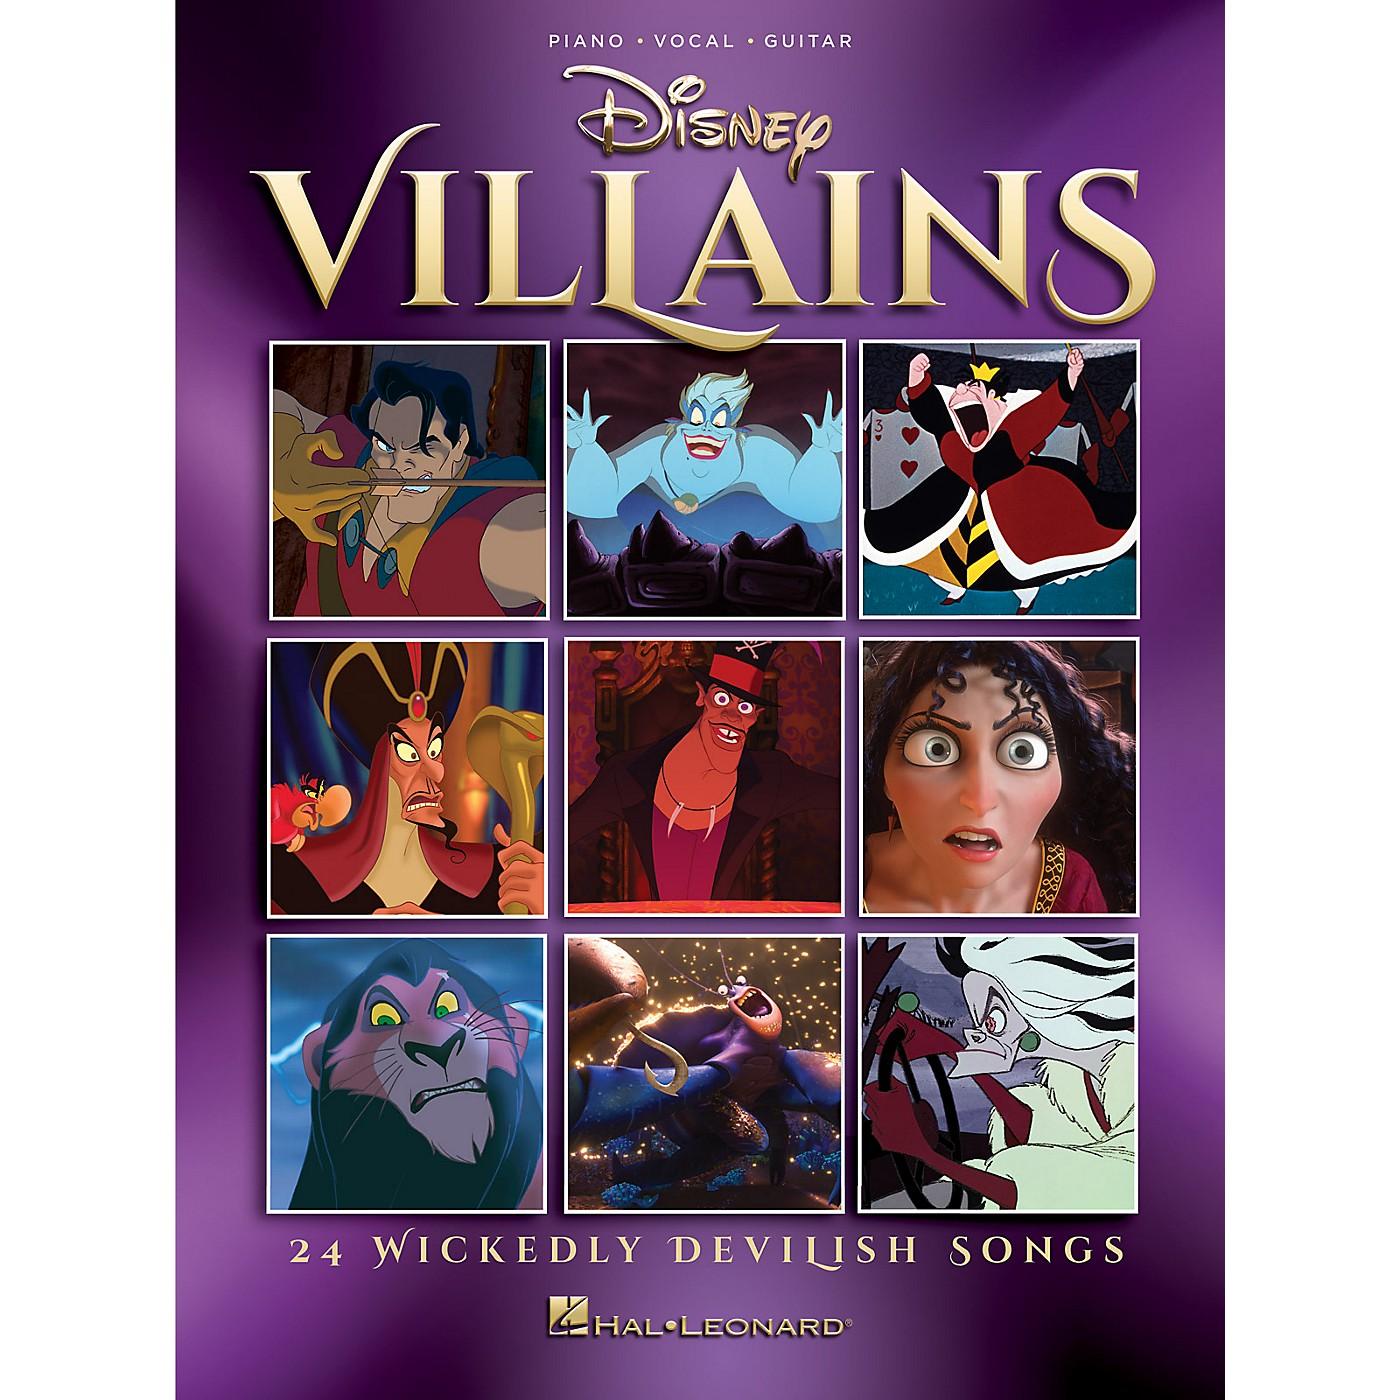 Hal Leonard Disney Villains (24 Wickedly Devilish Songs) Piano/Vocal/Guitar Songbook thumbnail